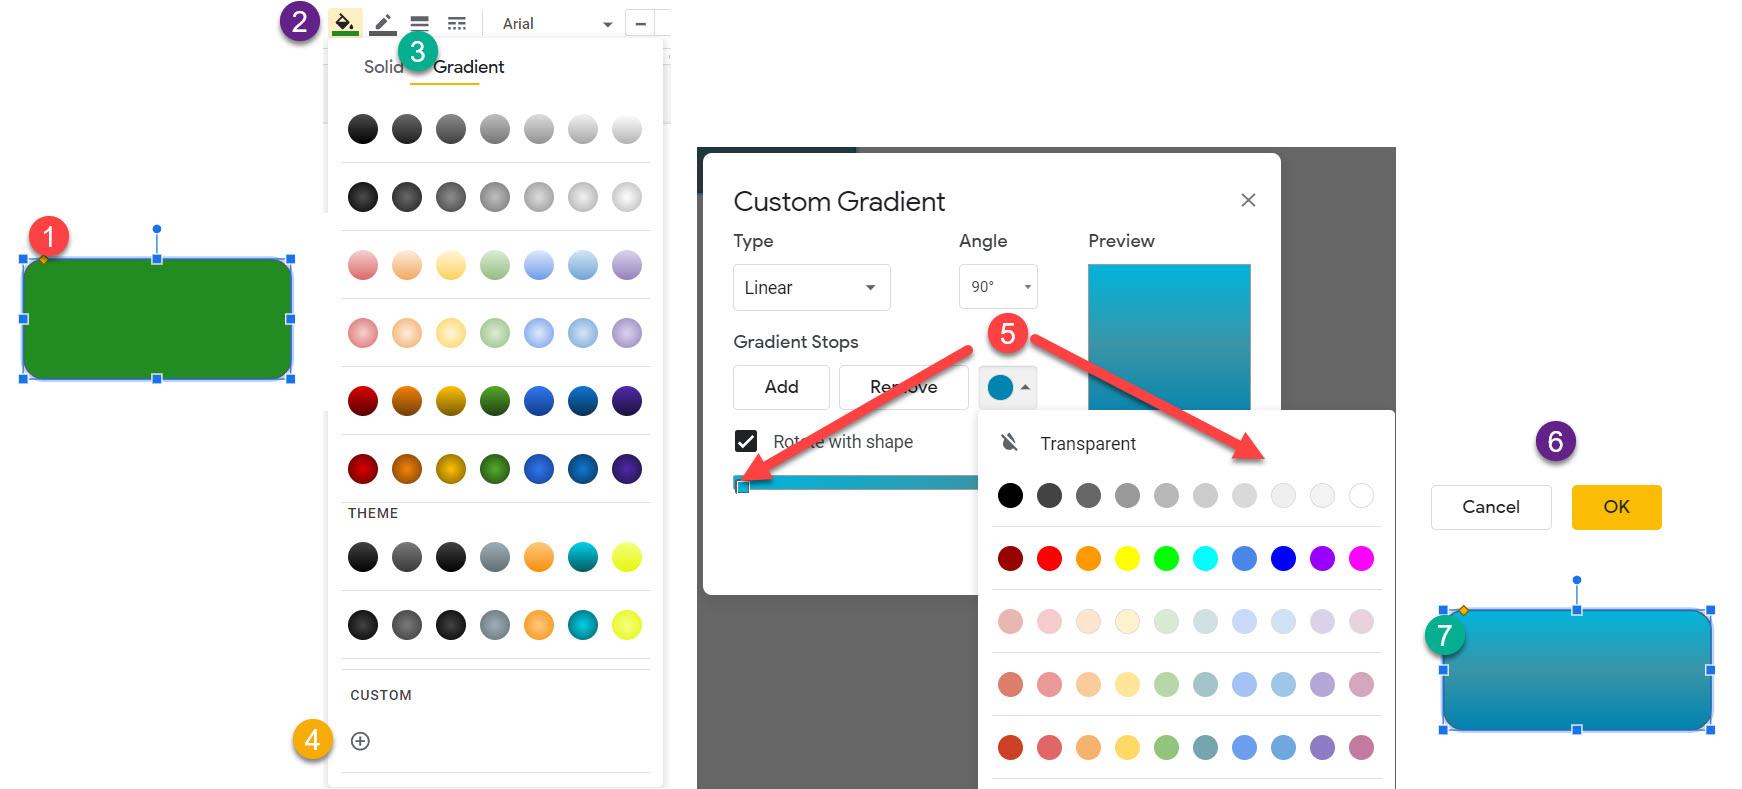 How to use custom gradient